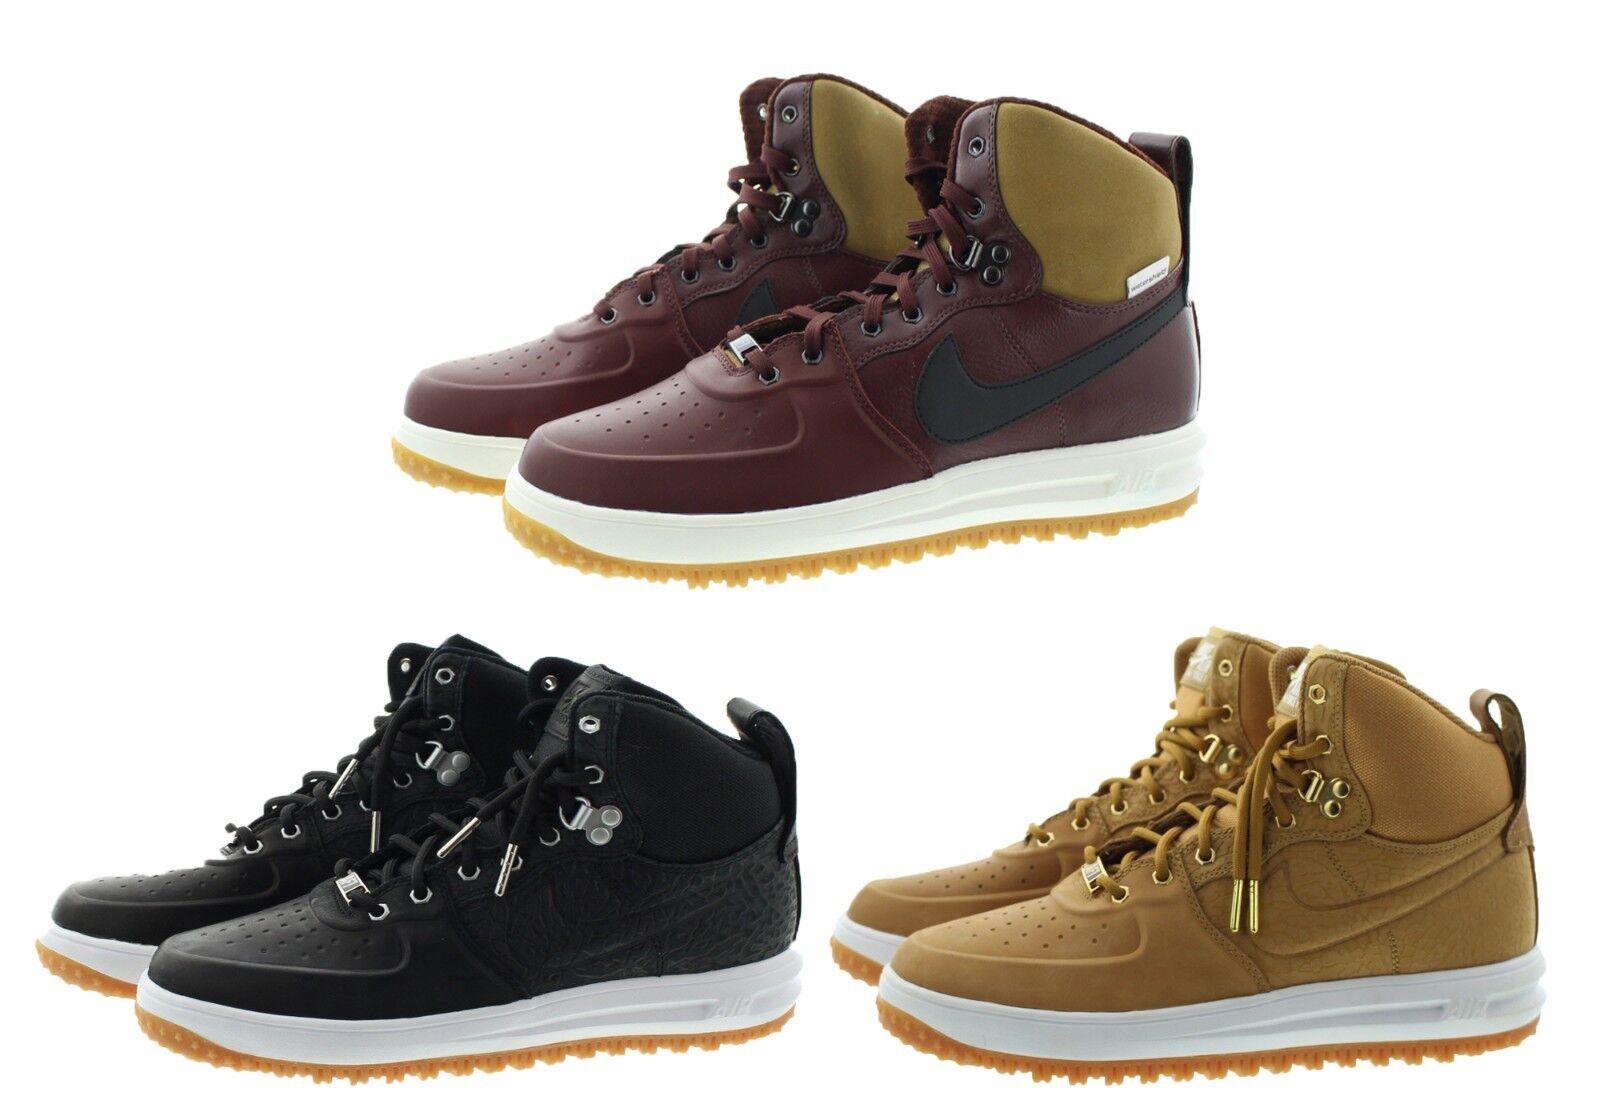 Nike 654481 Mens Air Lunar Force 1 1 1 High Top Sneakerboot